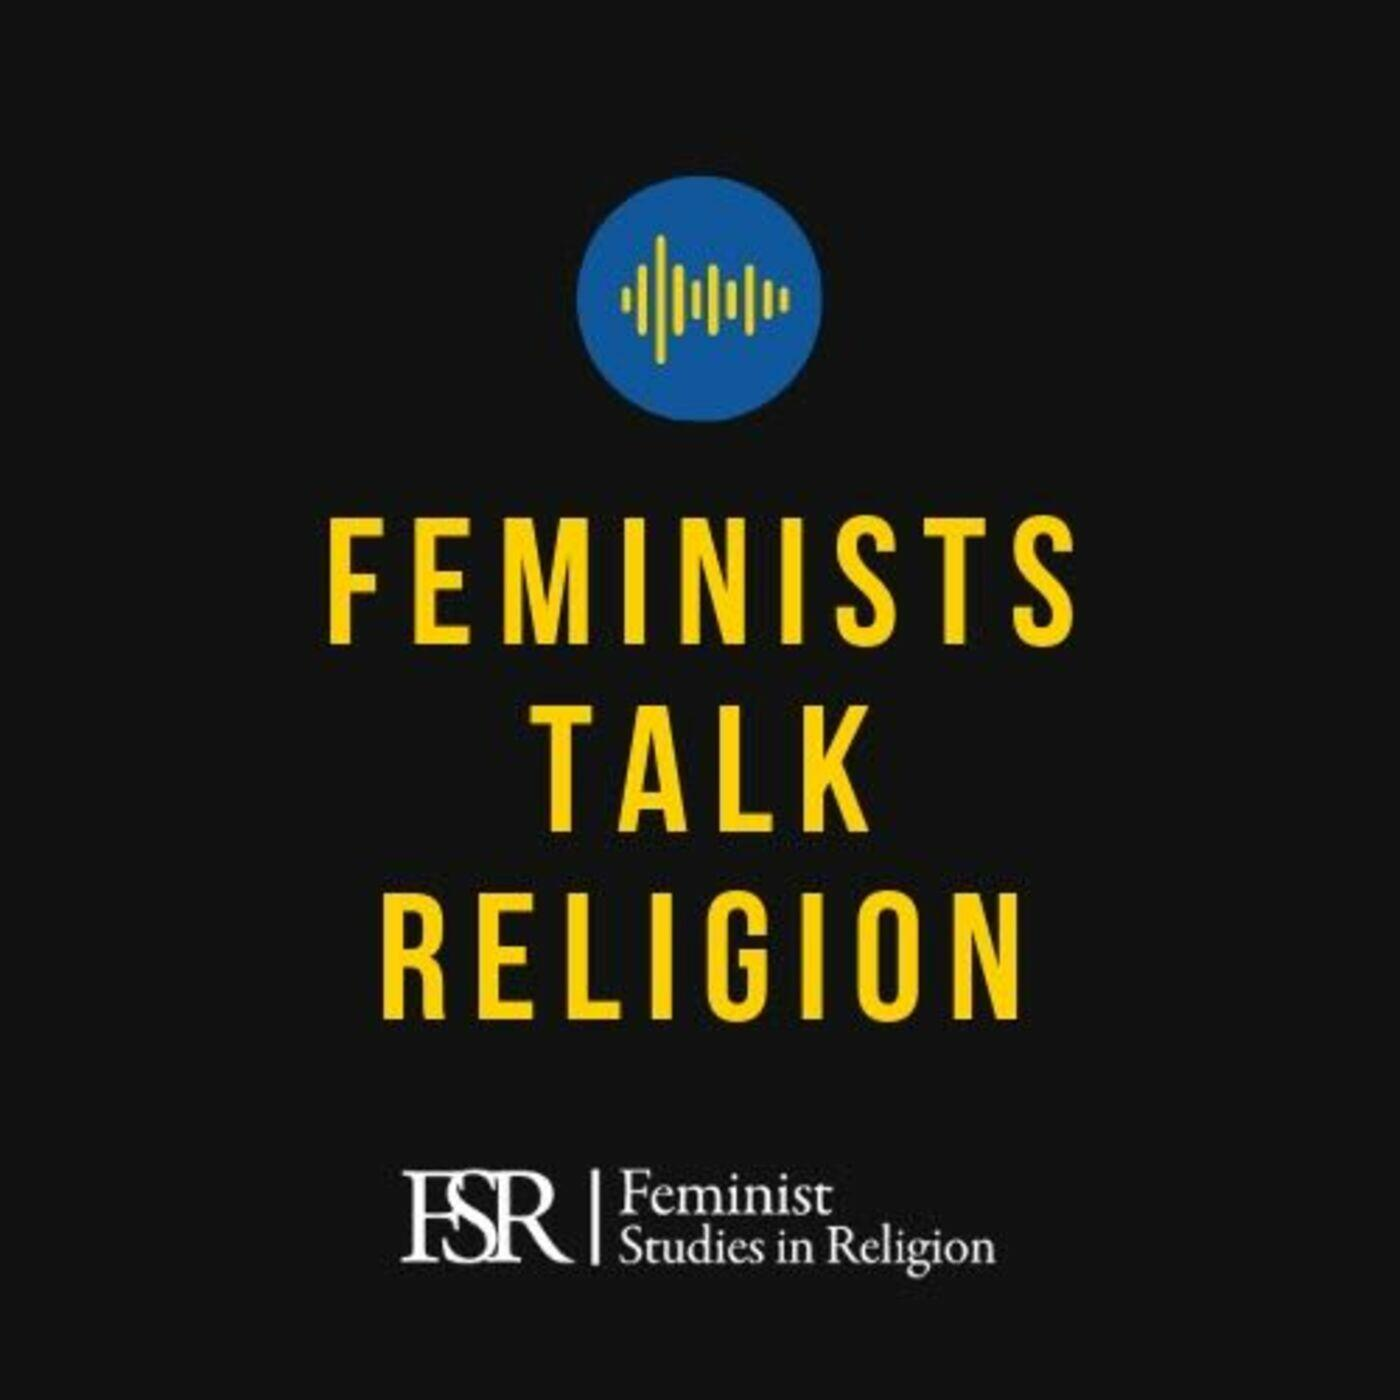 Feminists Talk Religion